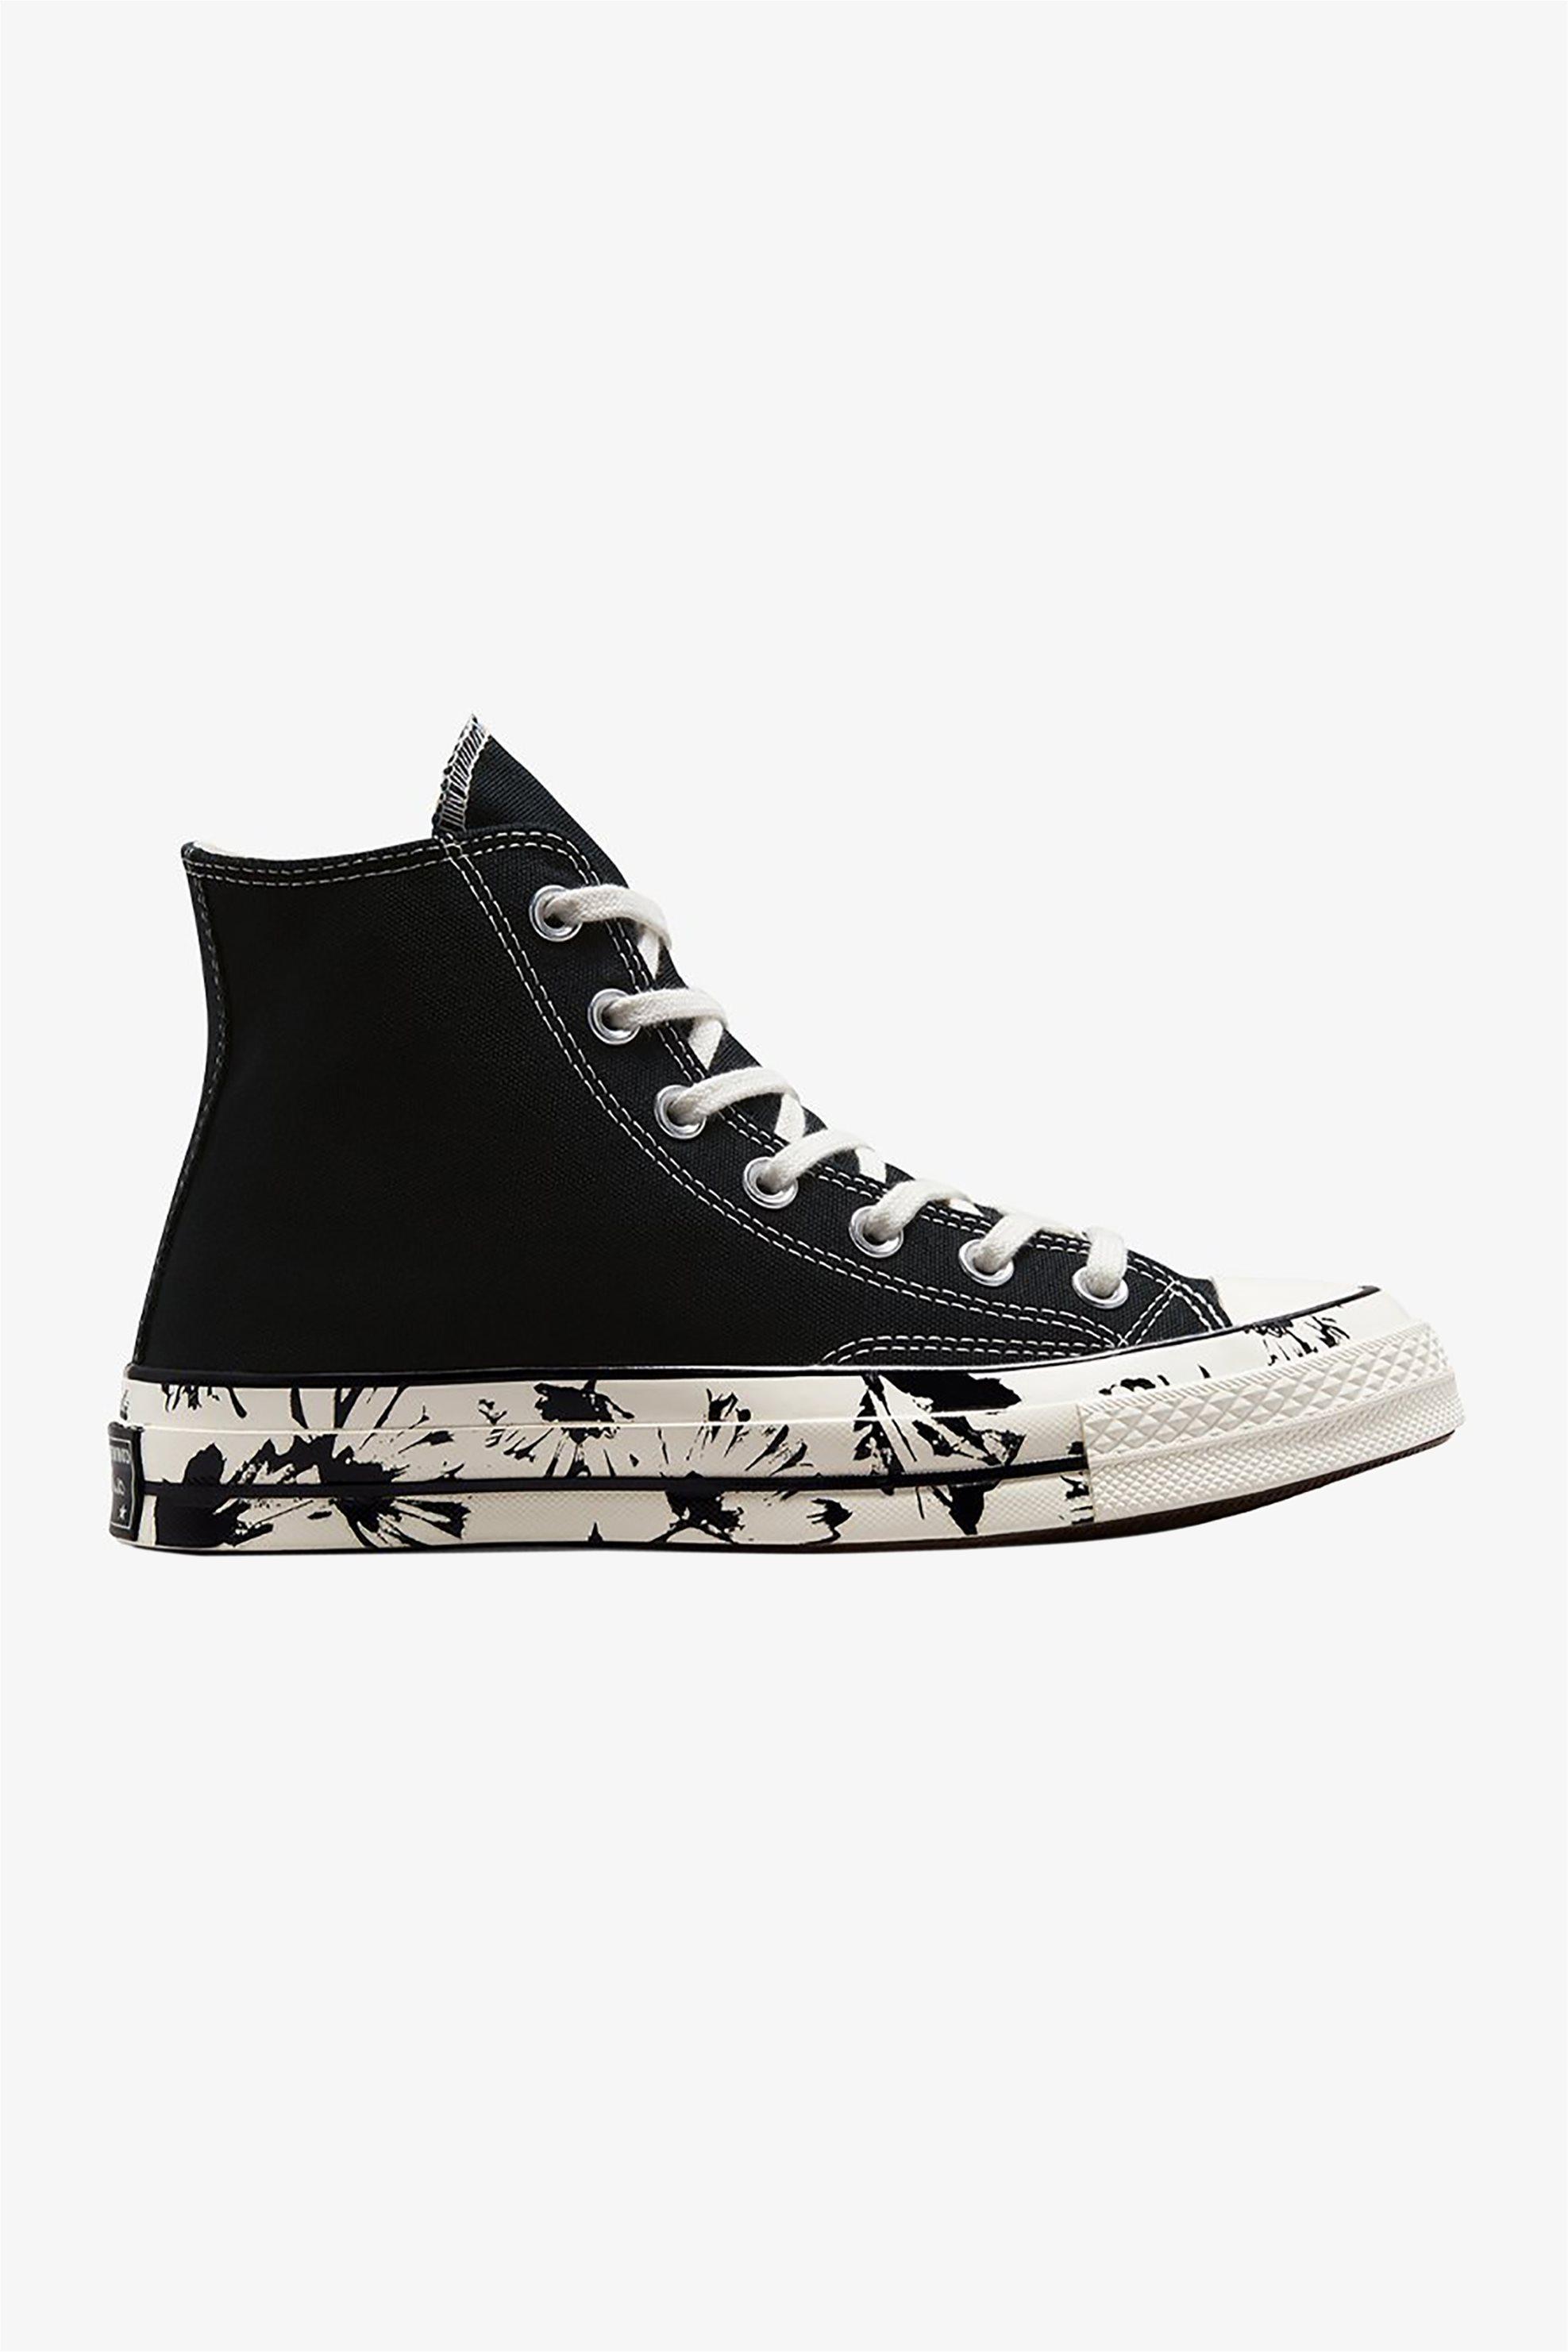 "Converse γυναικεία sneakers μποτάκια ""Chuck 70 Hi 'Floral Fusion""' – 571387C – Μαύρο"